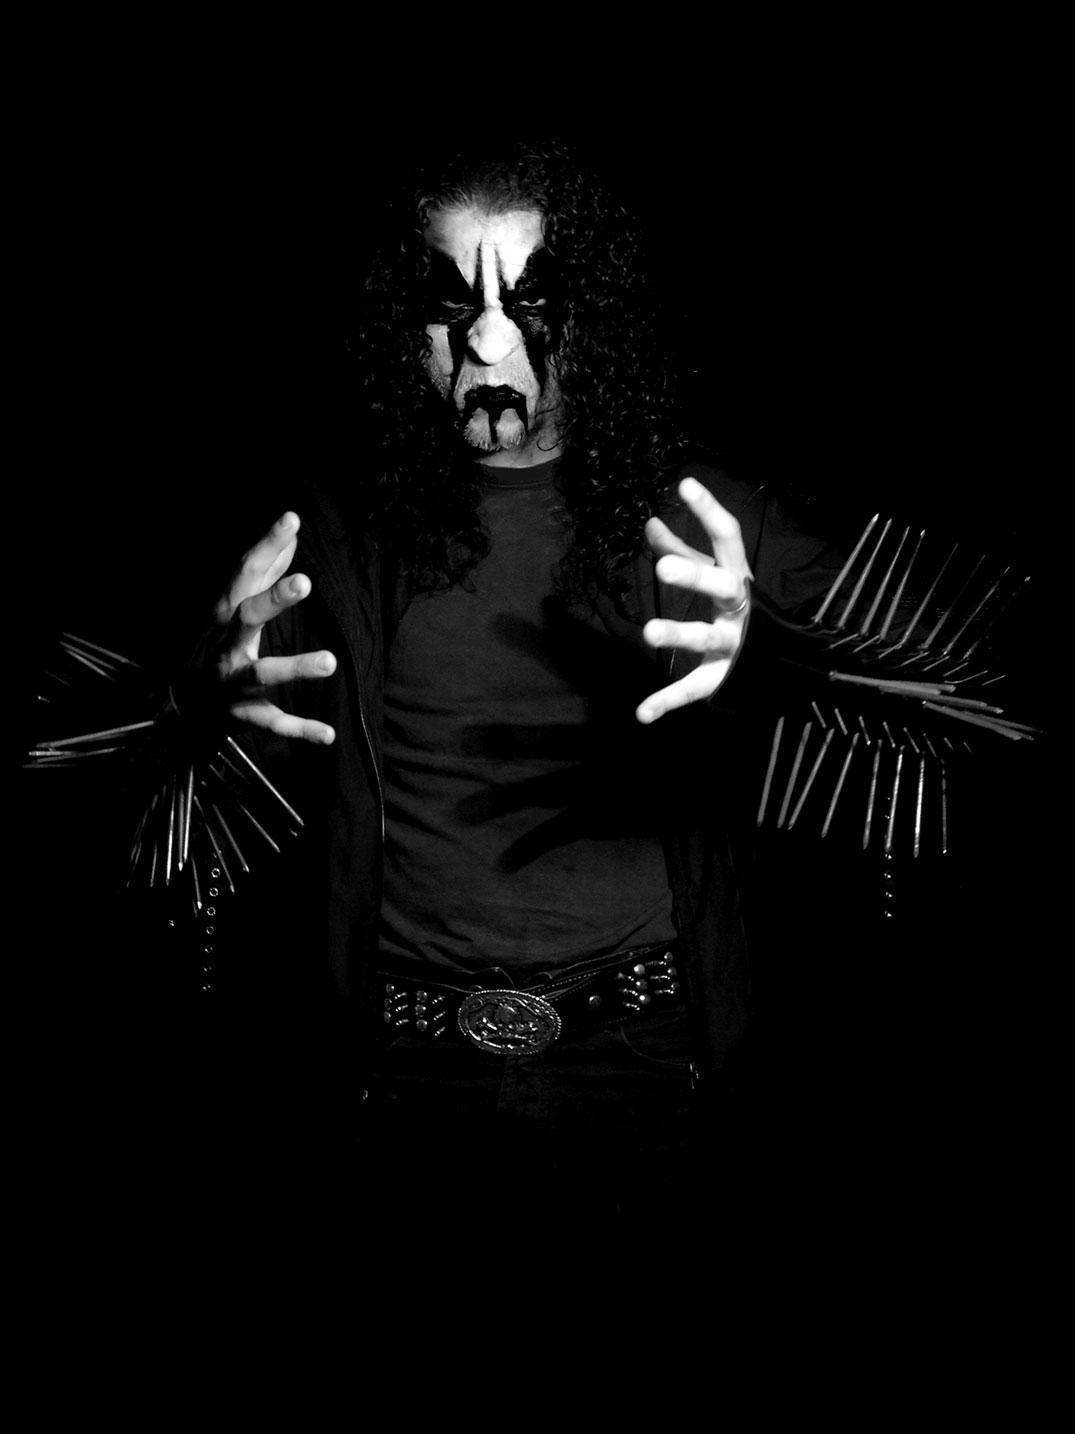 black metal 01 by naraosga-stock